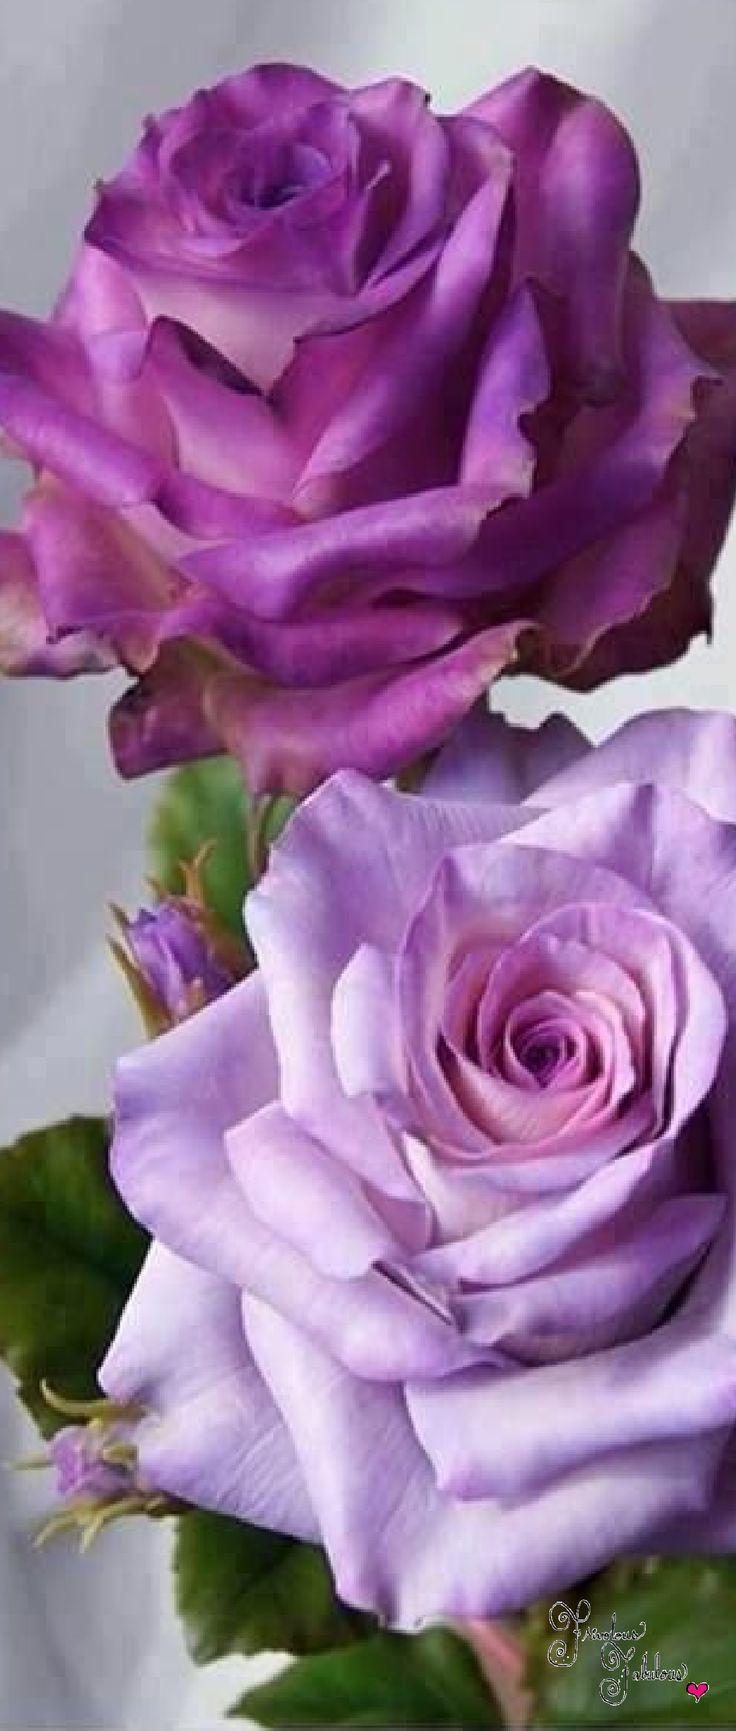 Gorgeous Roses …